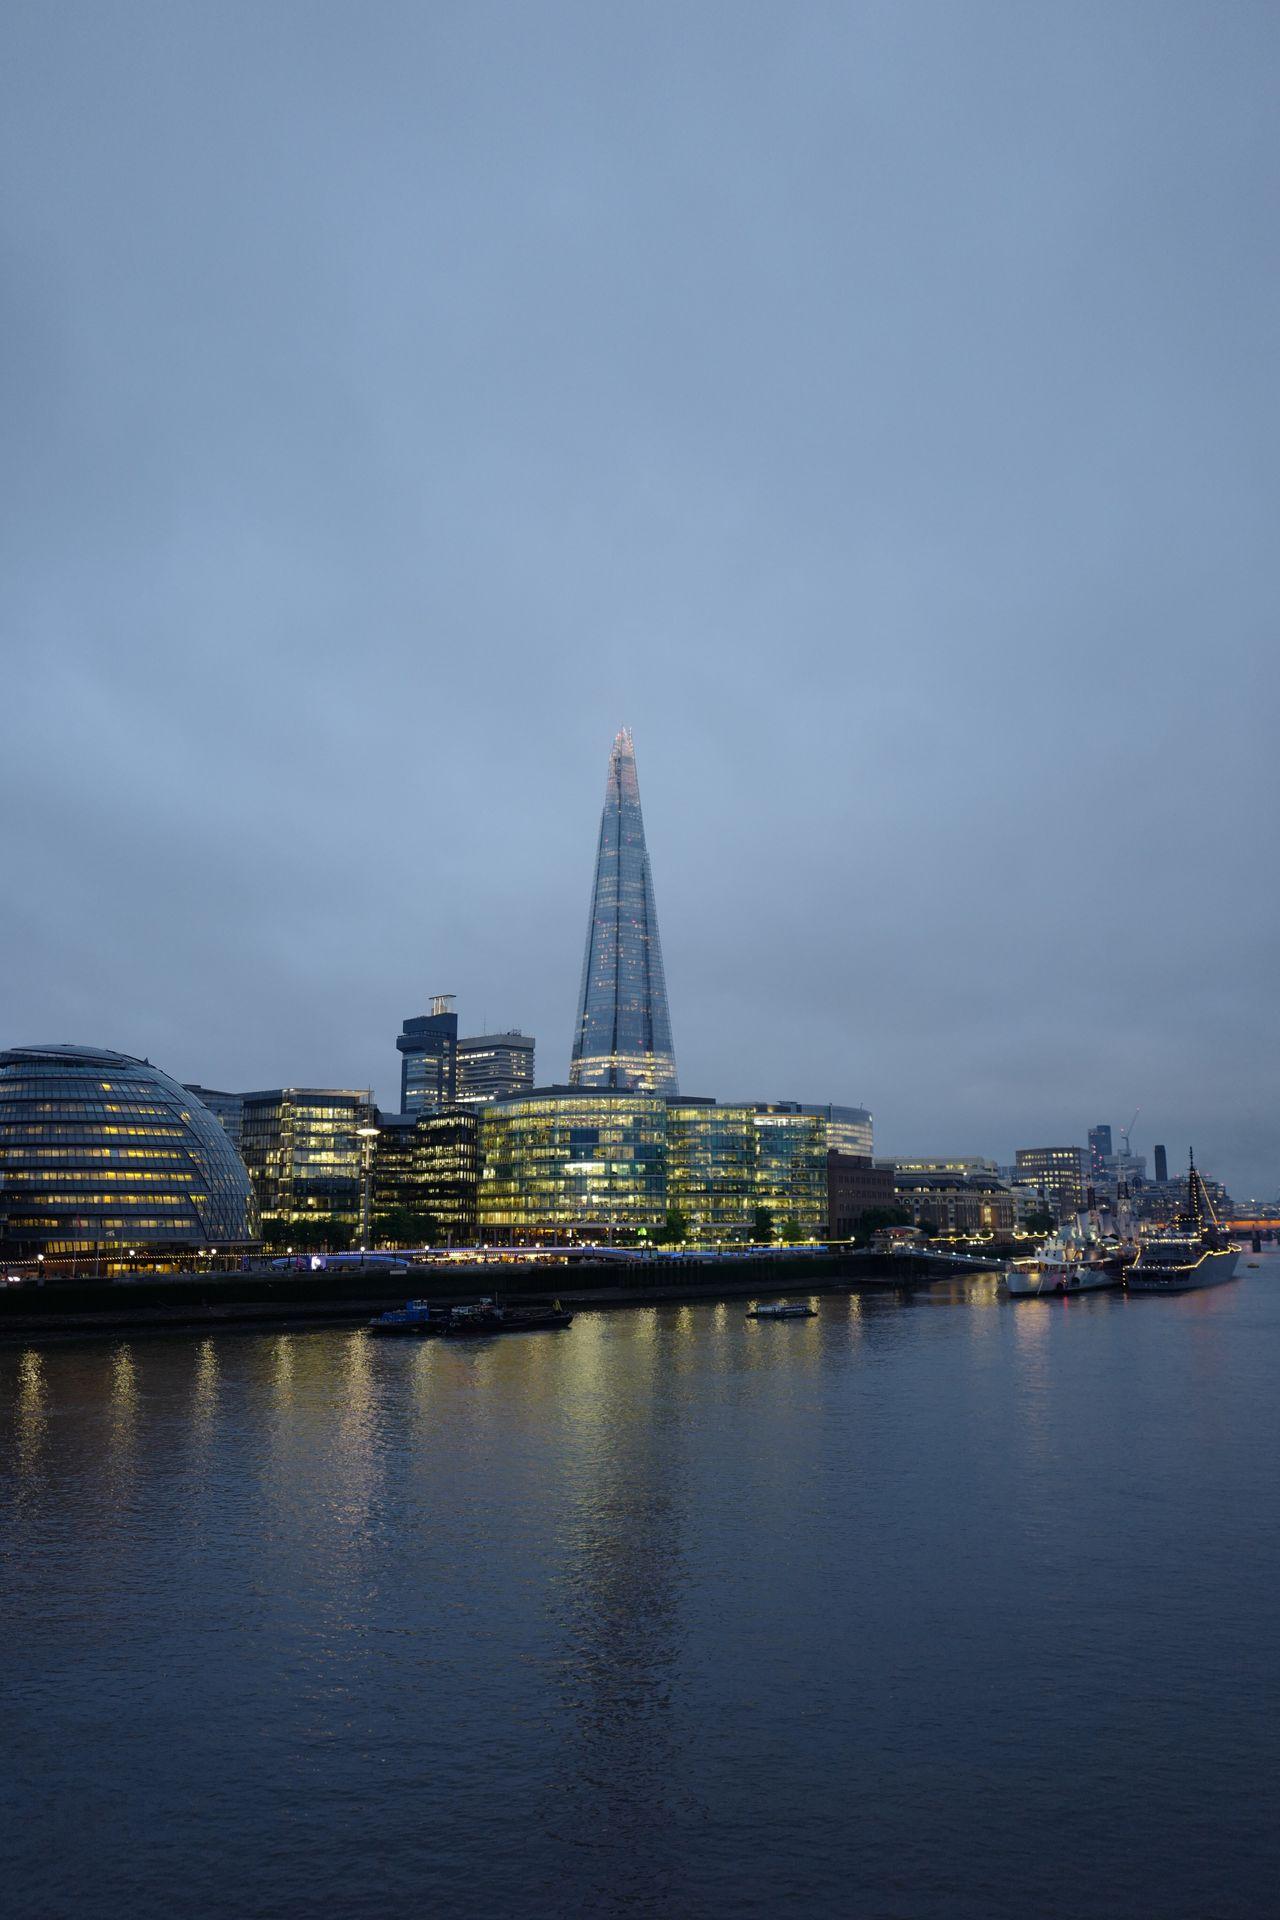 The Shard, London Sky Scraper Skyline Thames River South Bank London Architecture Dusk City Lights